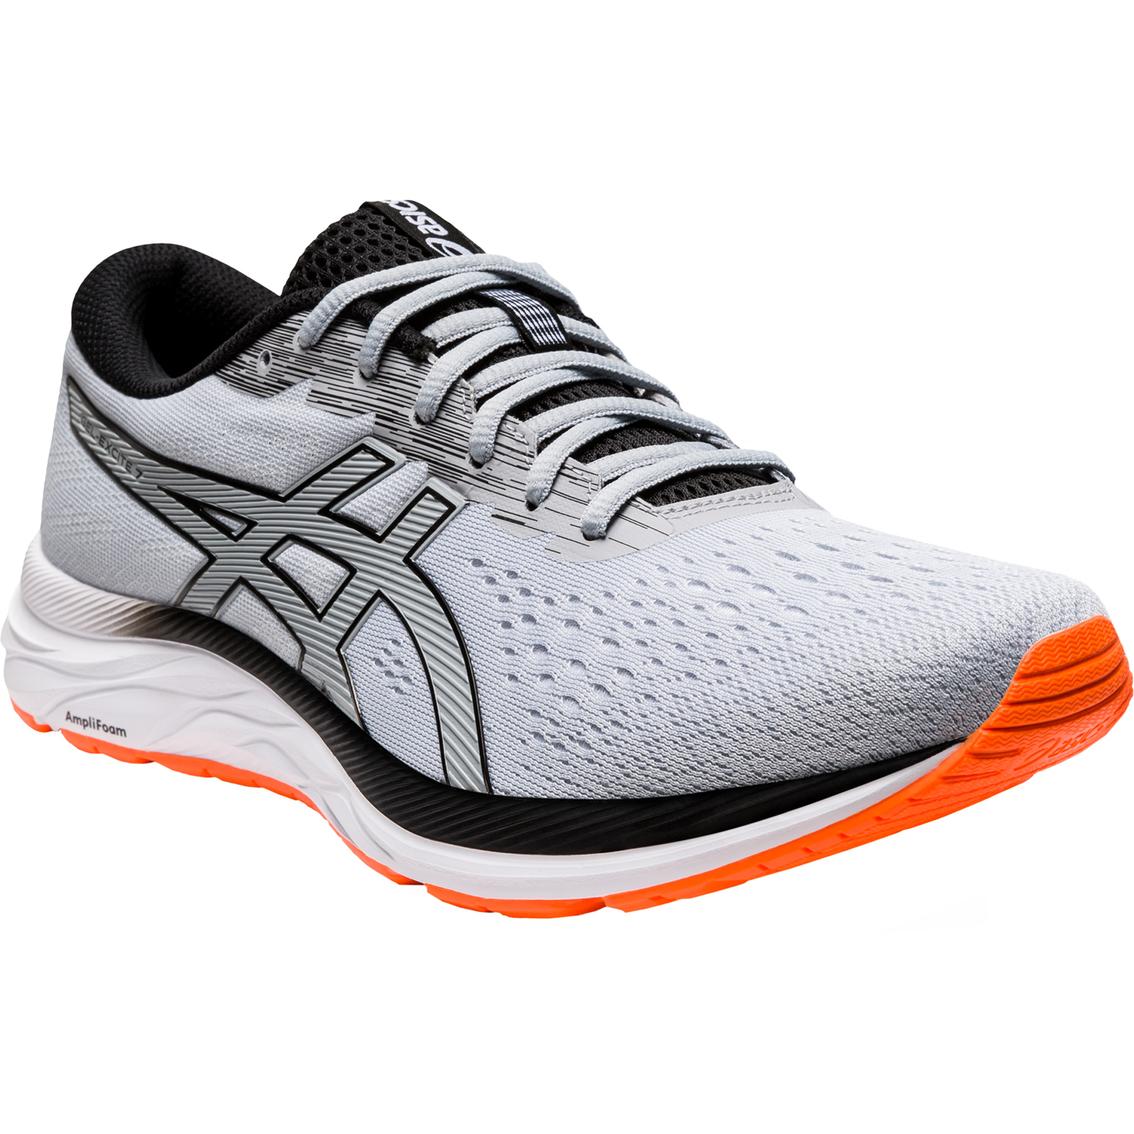 Asics Men's Gel Excite 7 Running Shoes | Running | Shoes | Shop ...